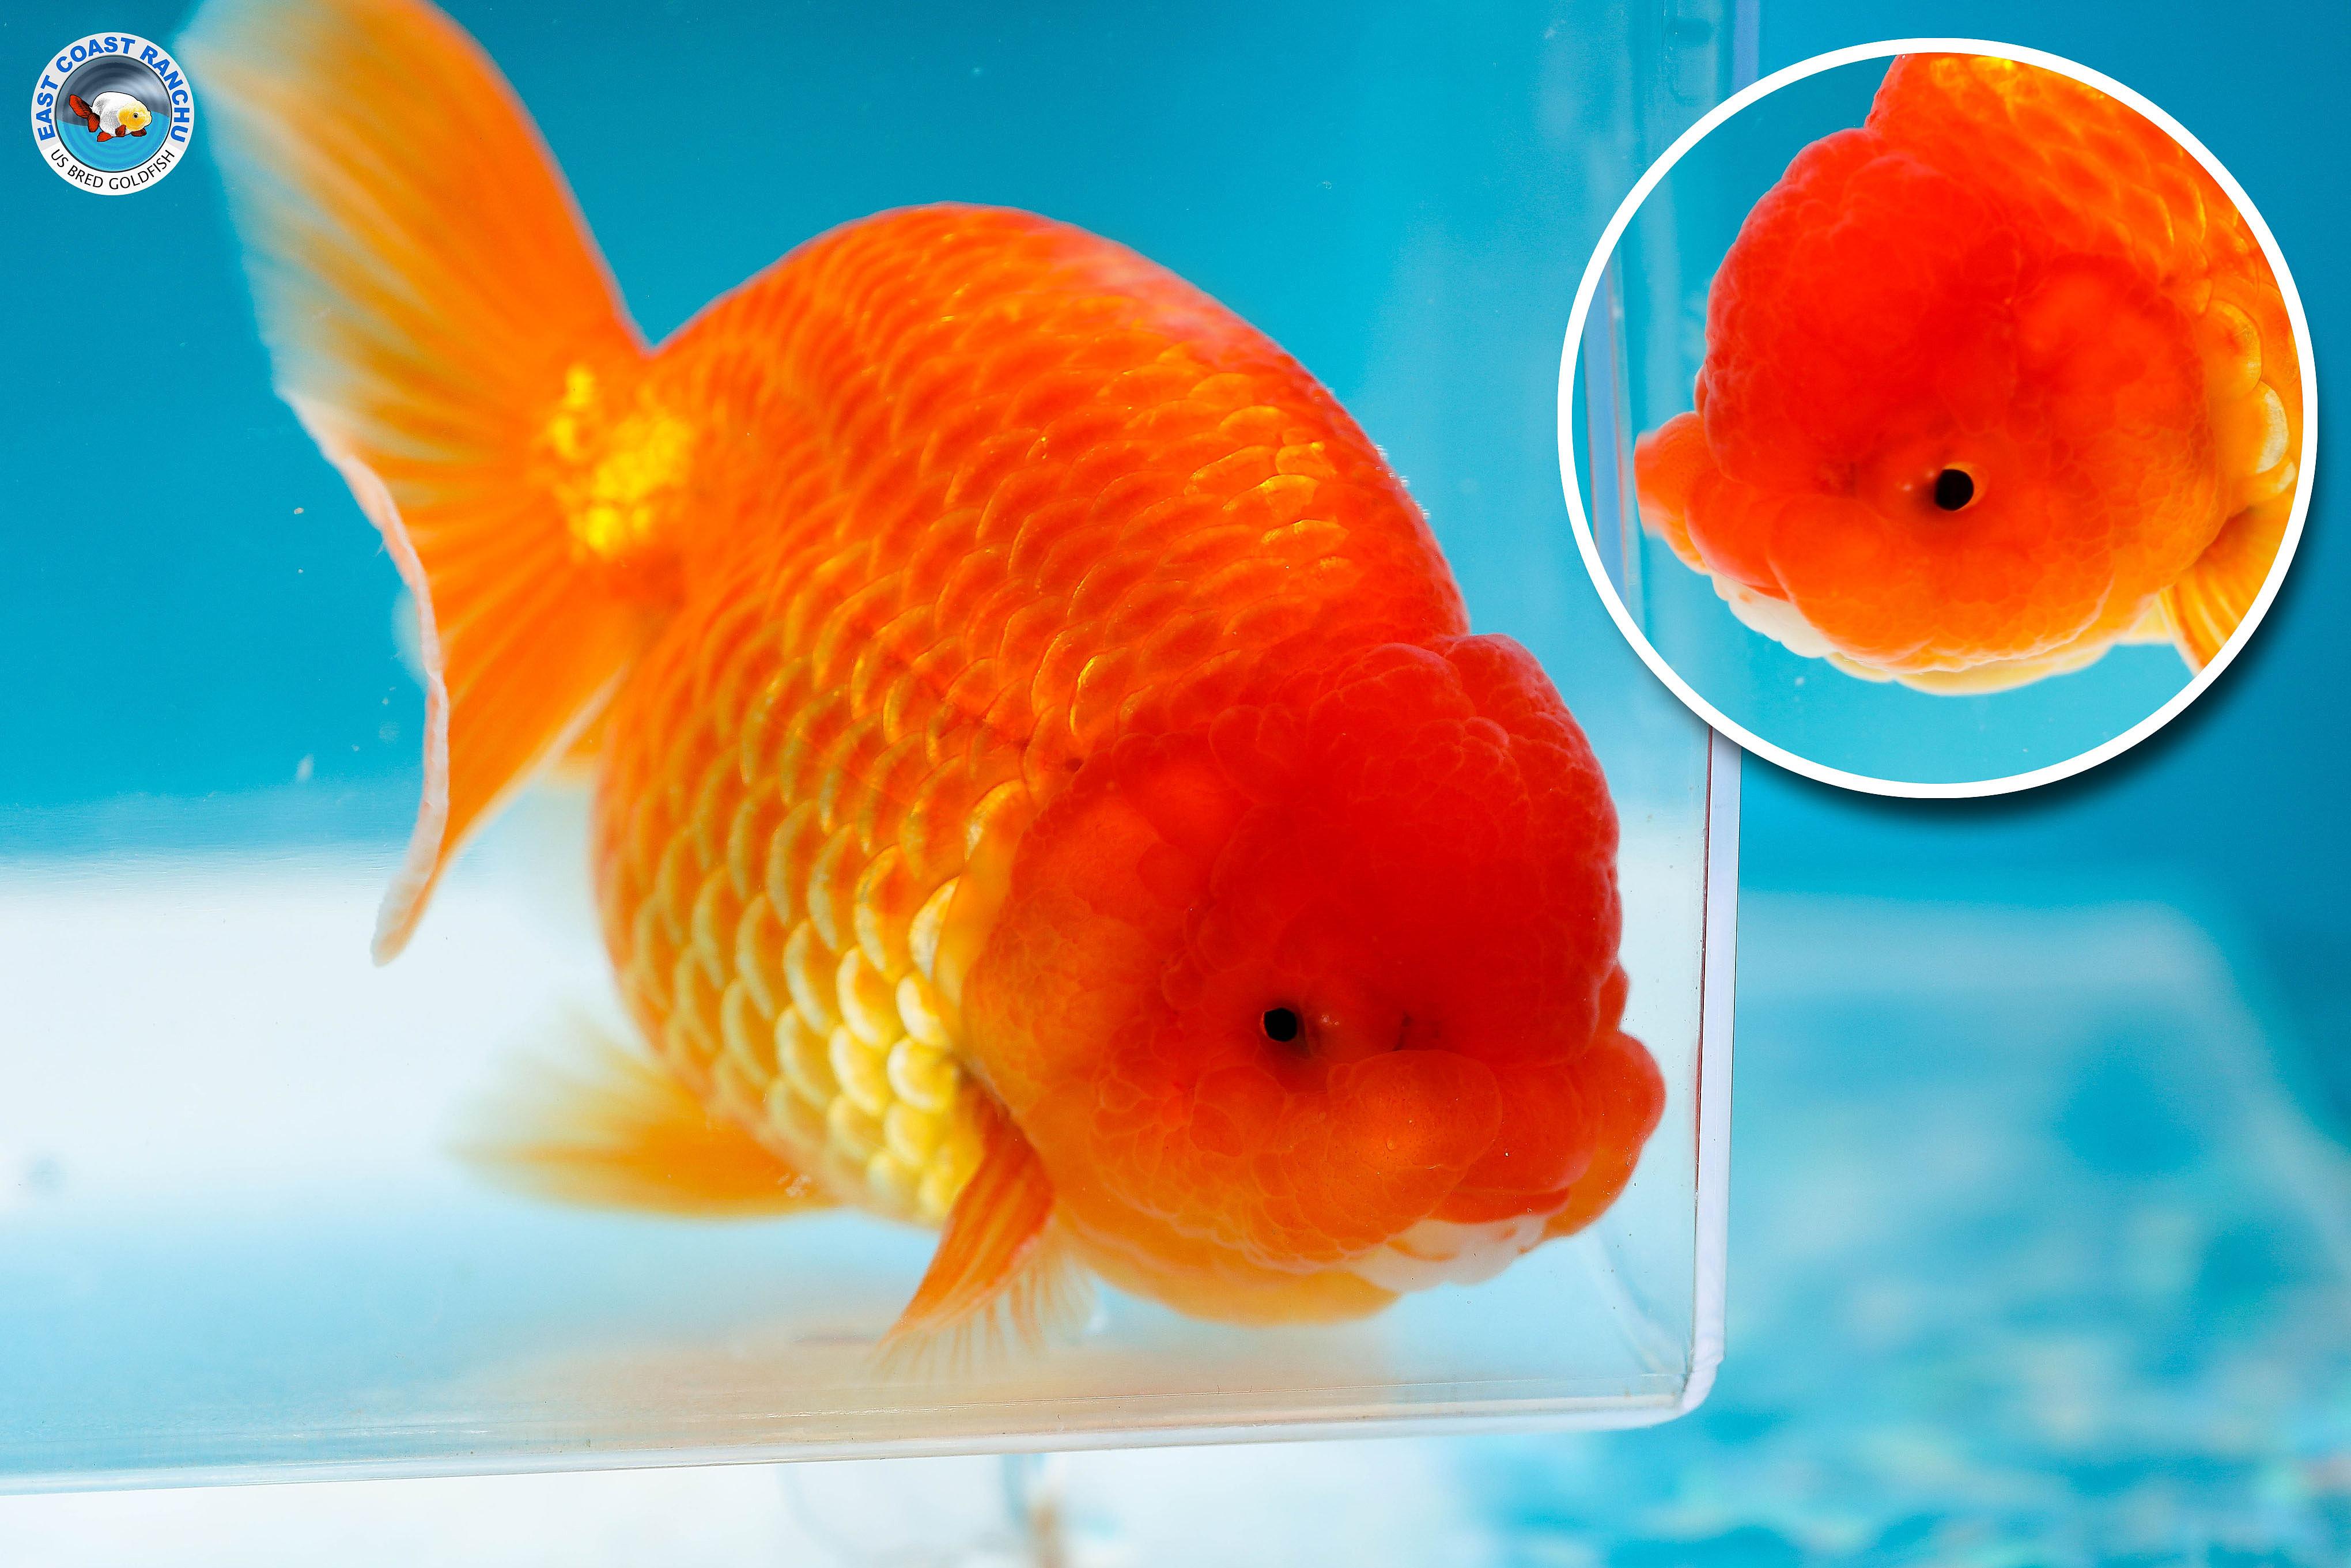 Red ranchu goldfish